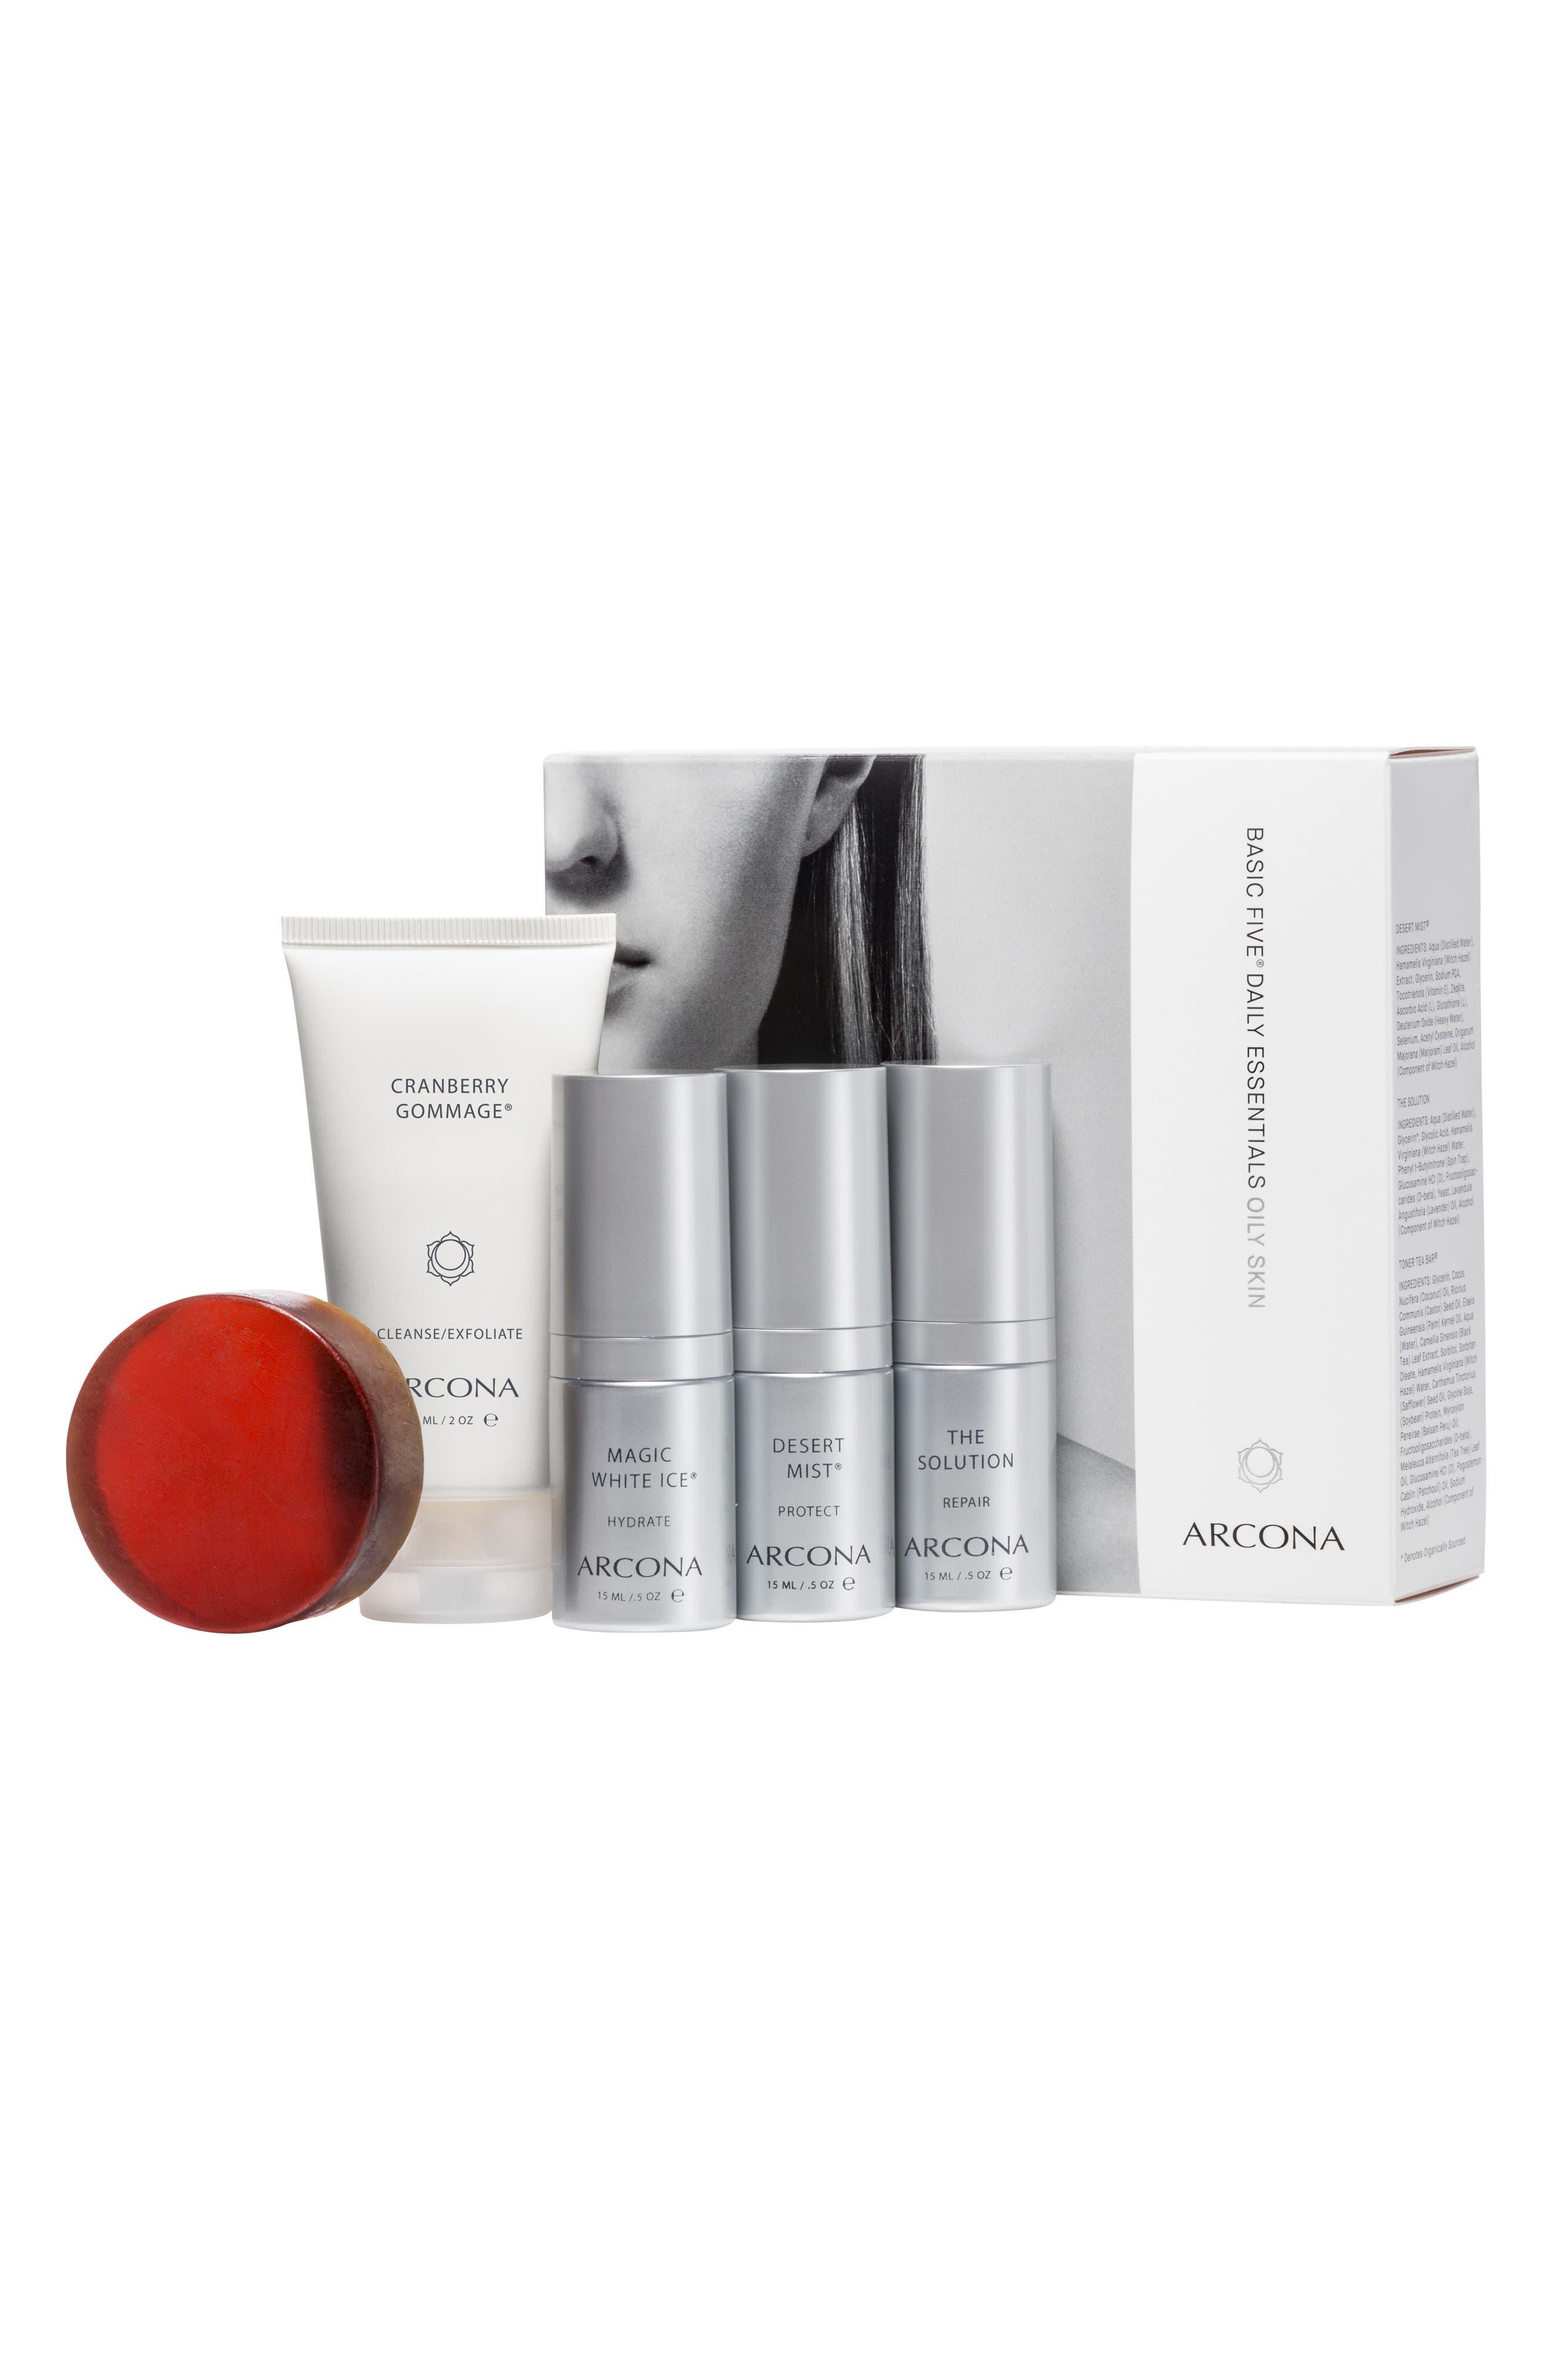 Basic Five Oily Skin Type Set